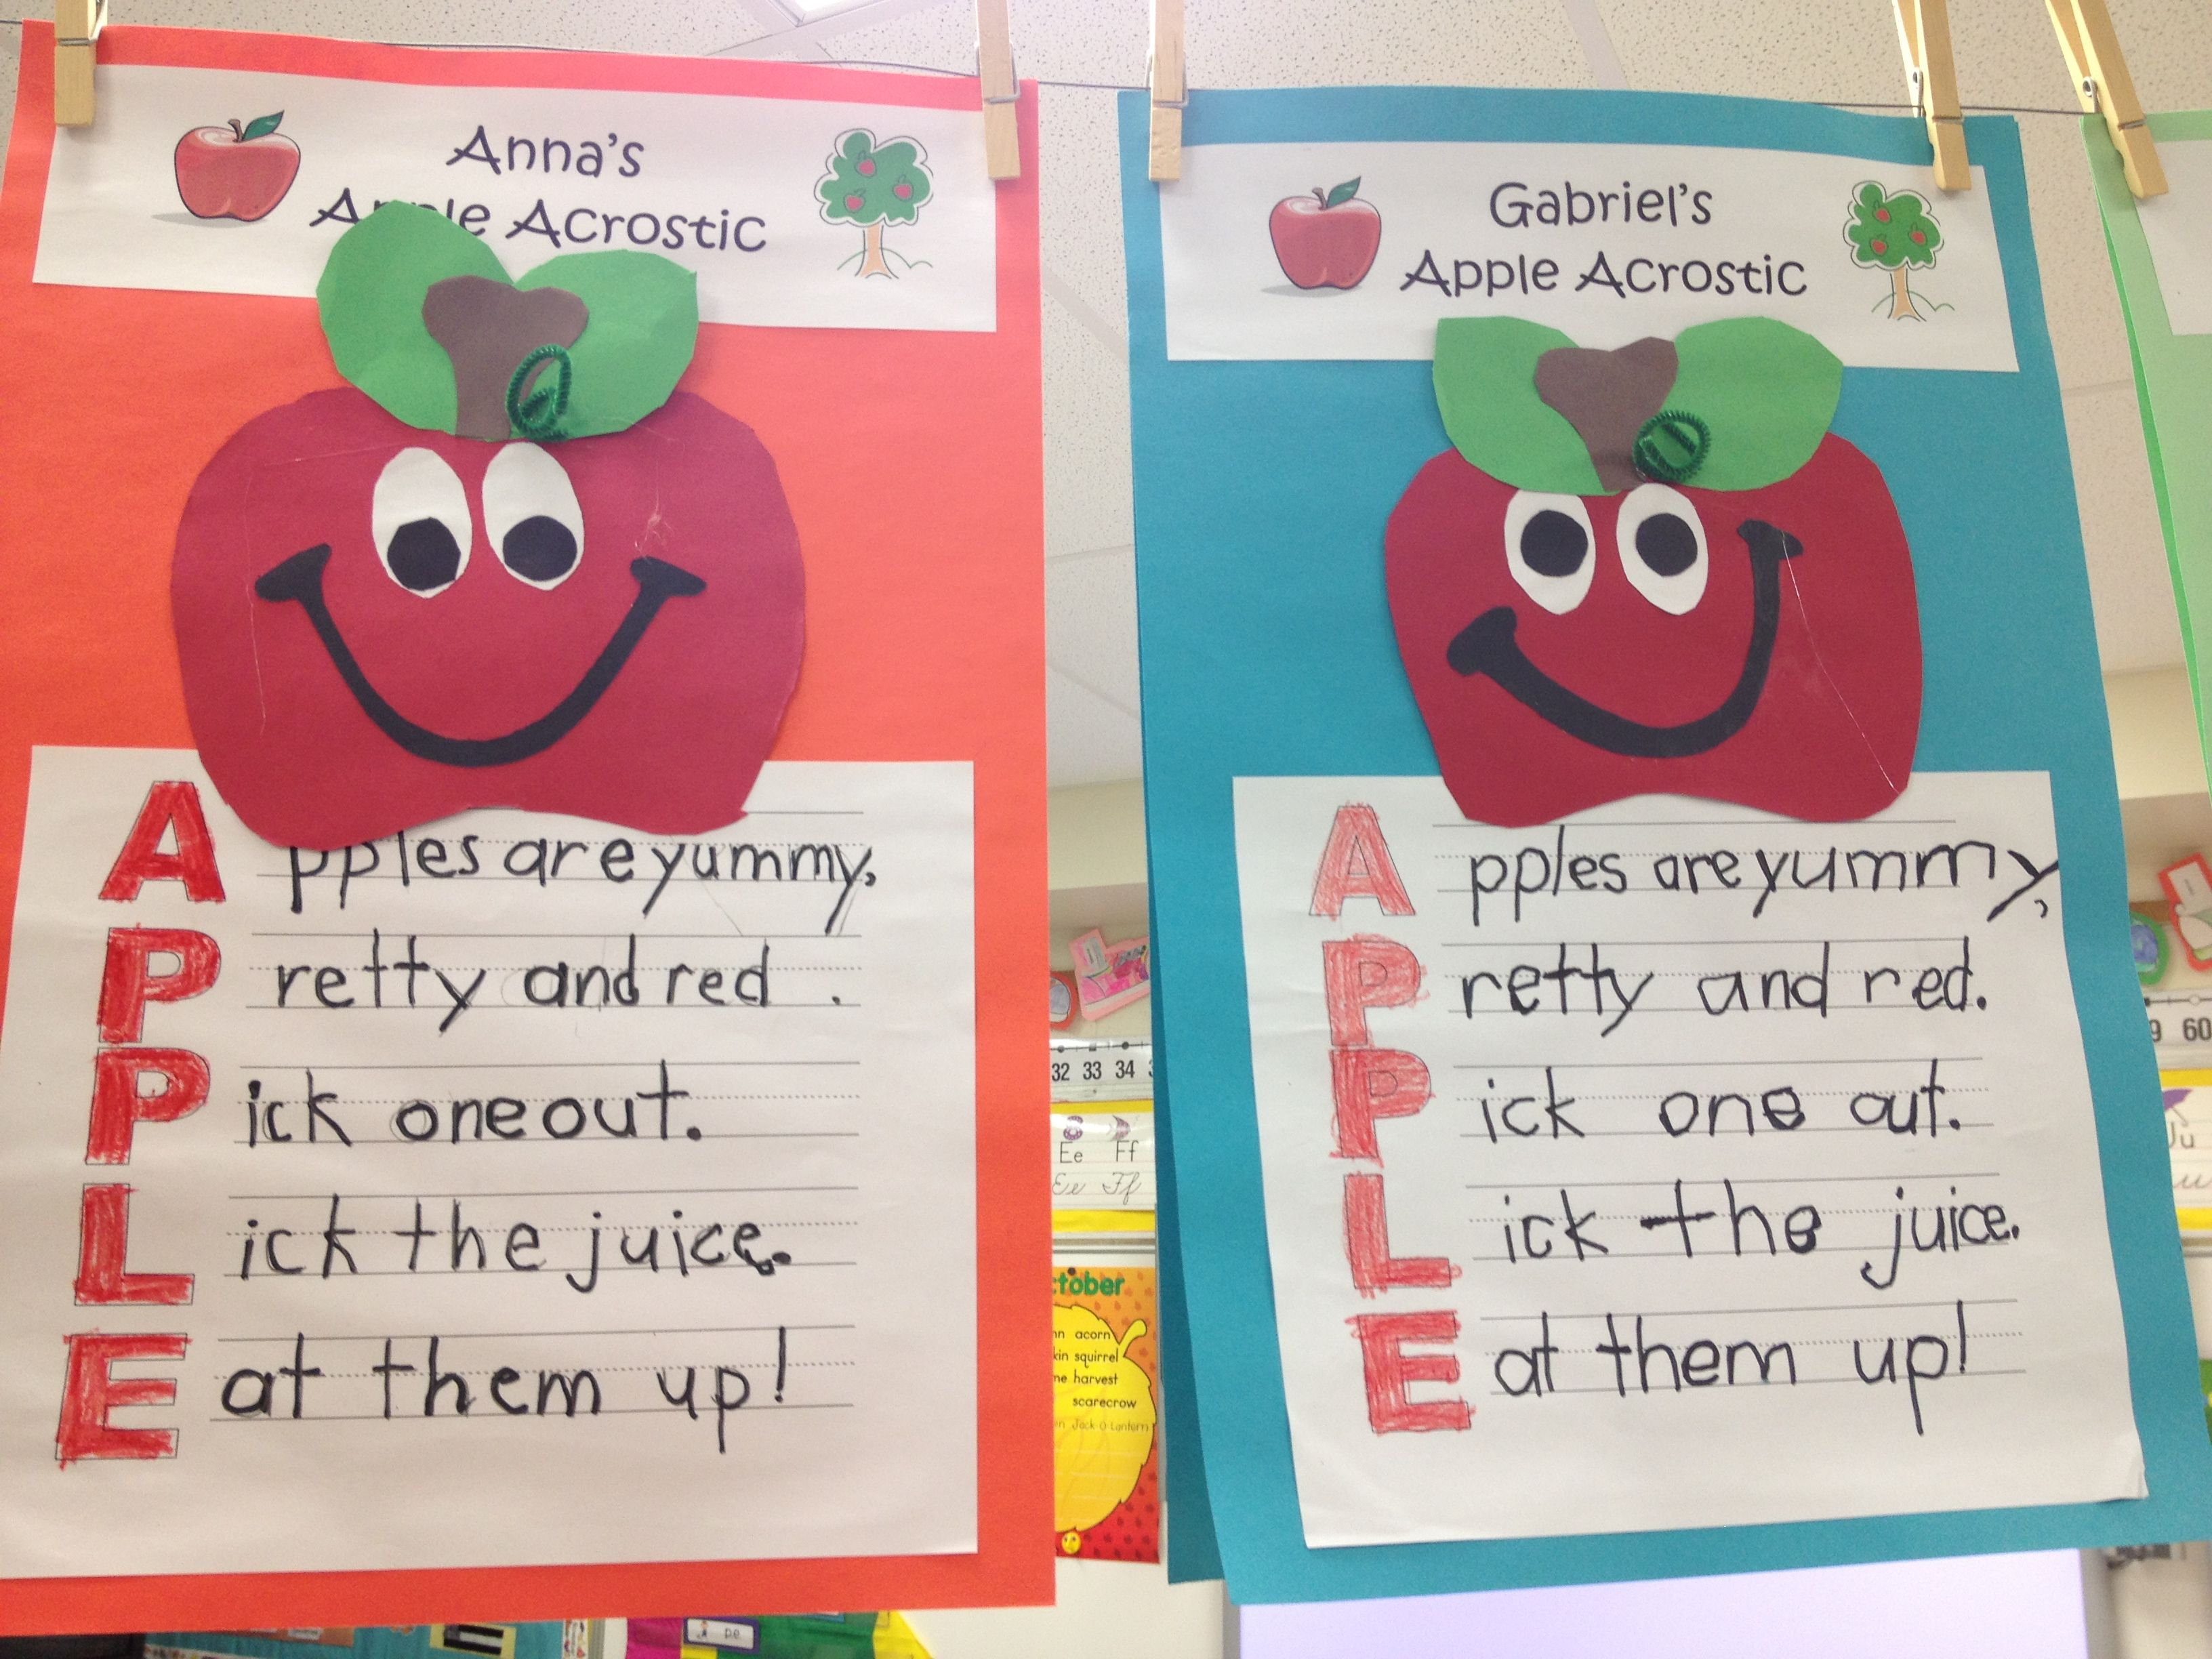 Apple Acrostic Poem